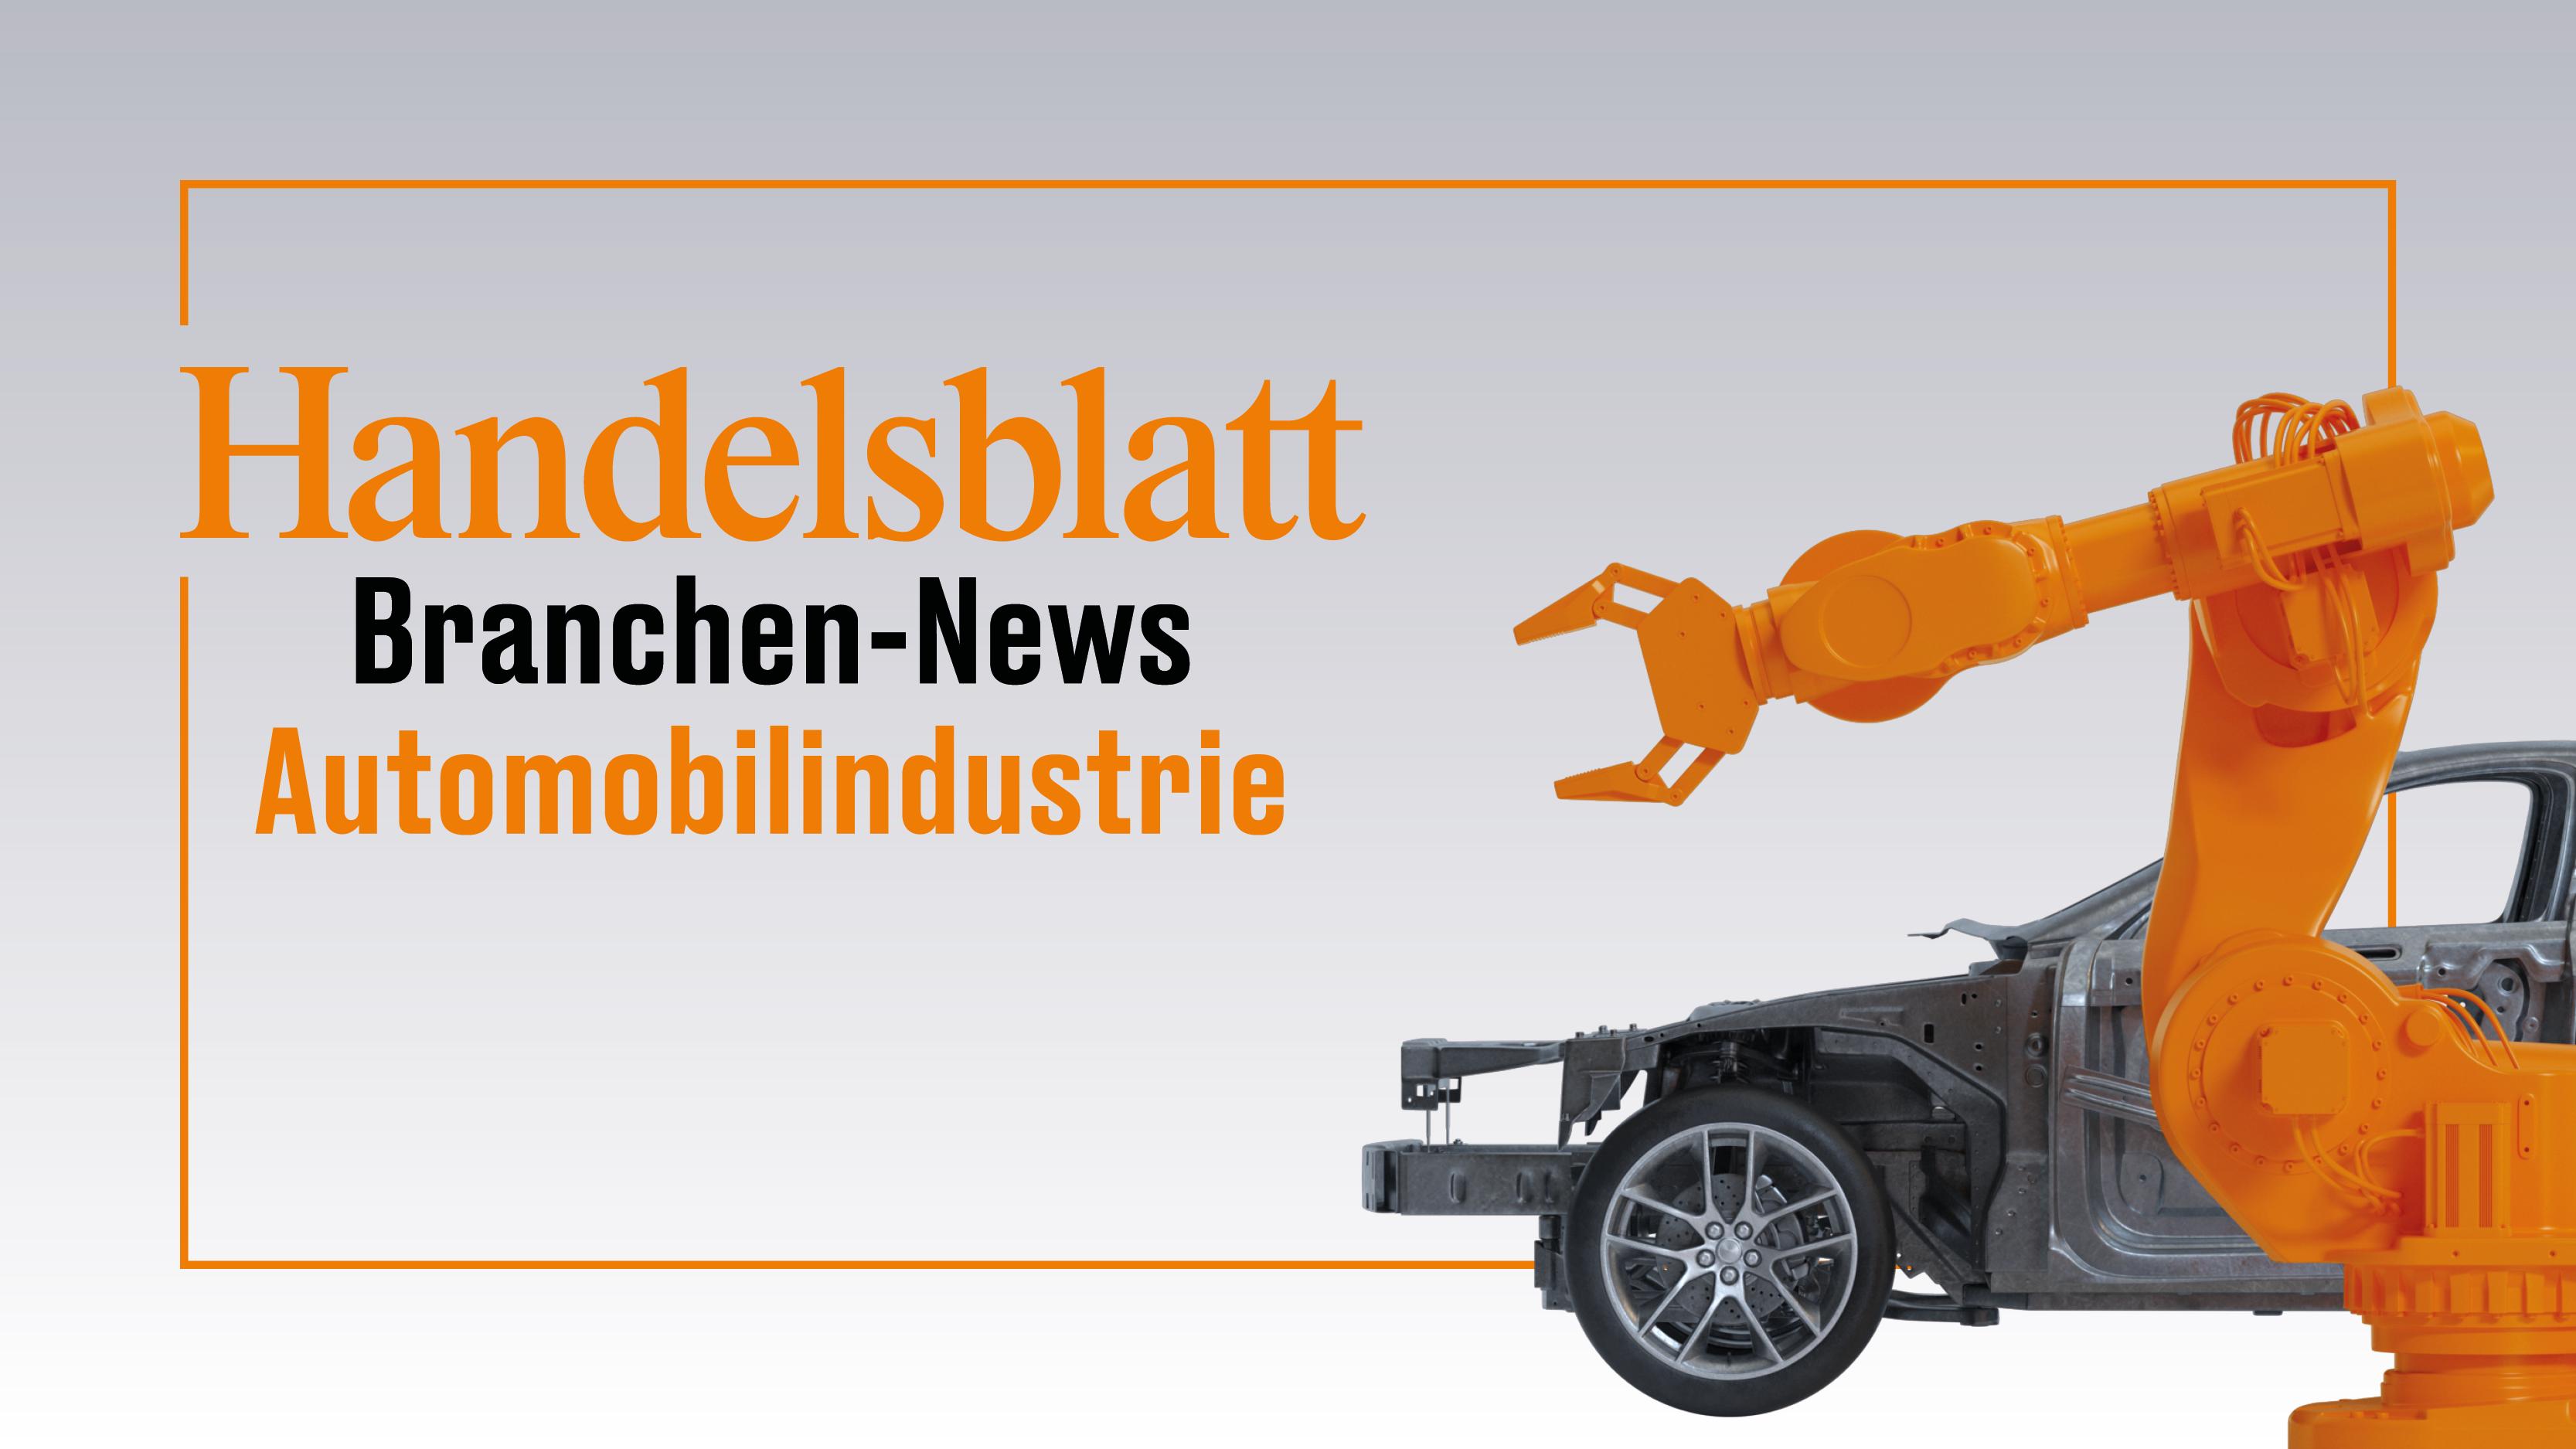 Handelsblatt Branchen-News: Automobilindustrie